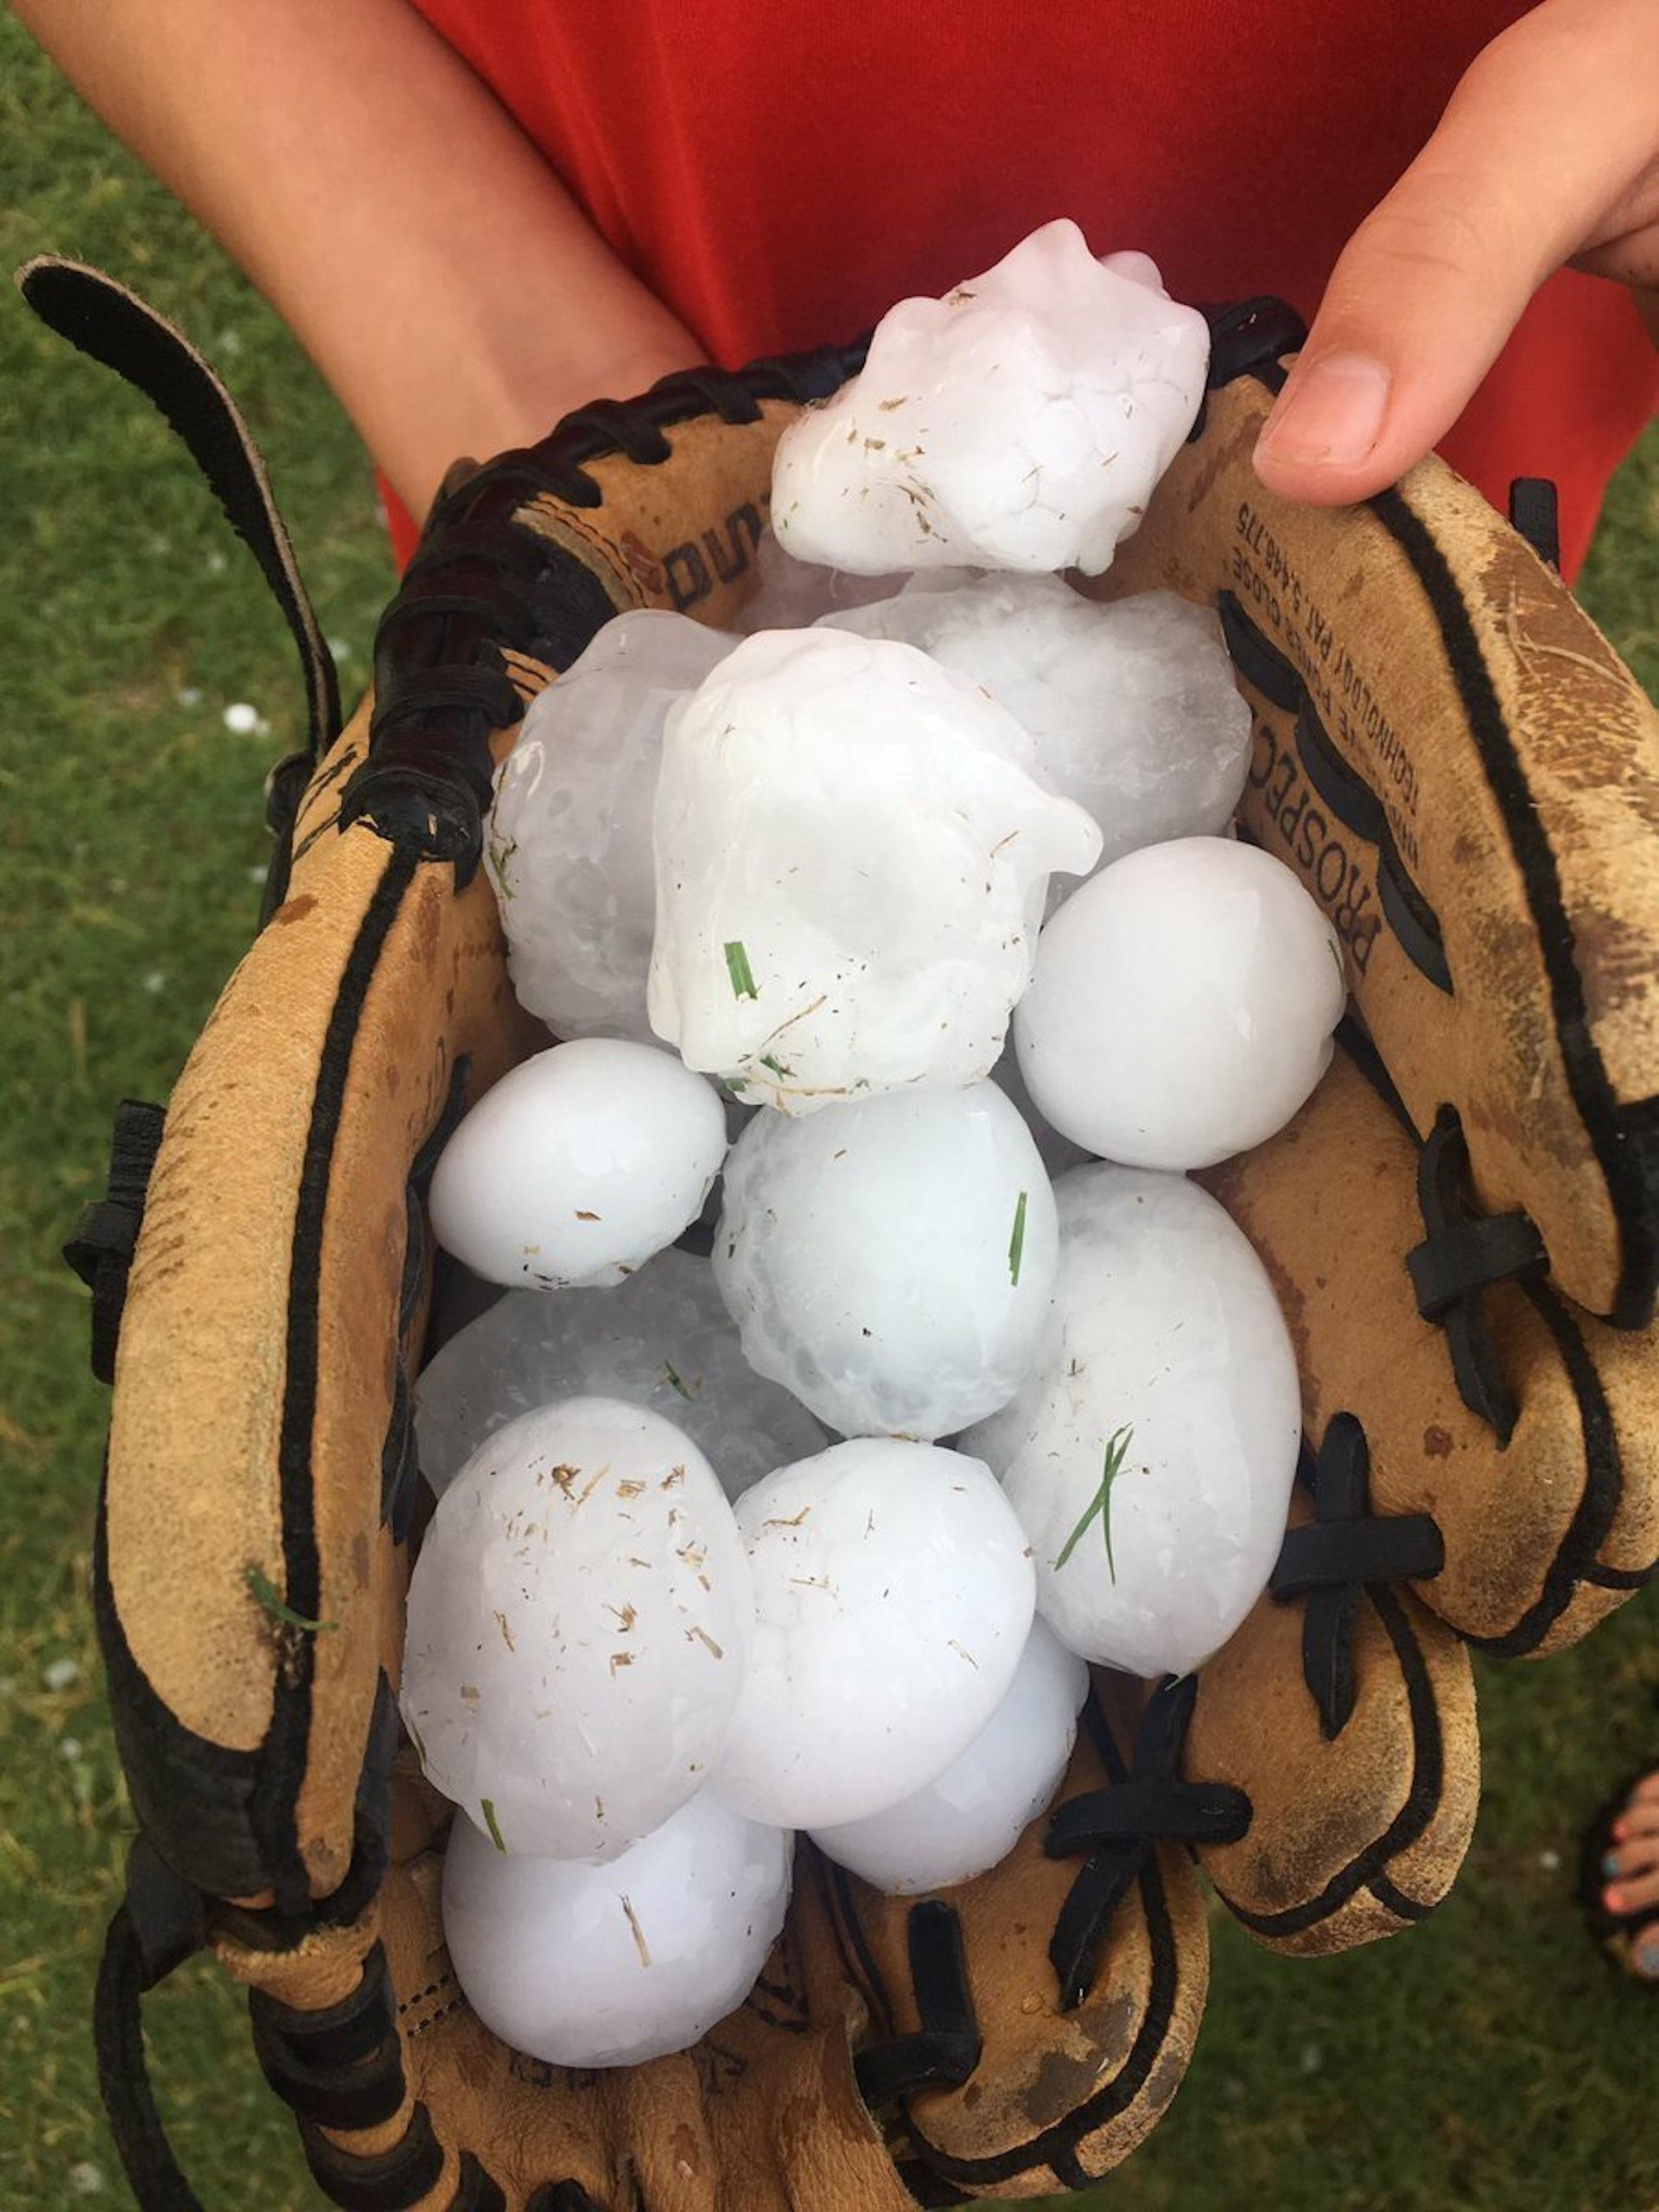 Large hailstones fill a baseball mitt